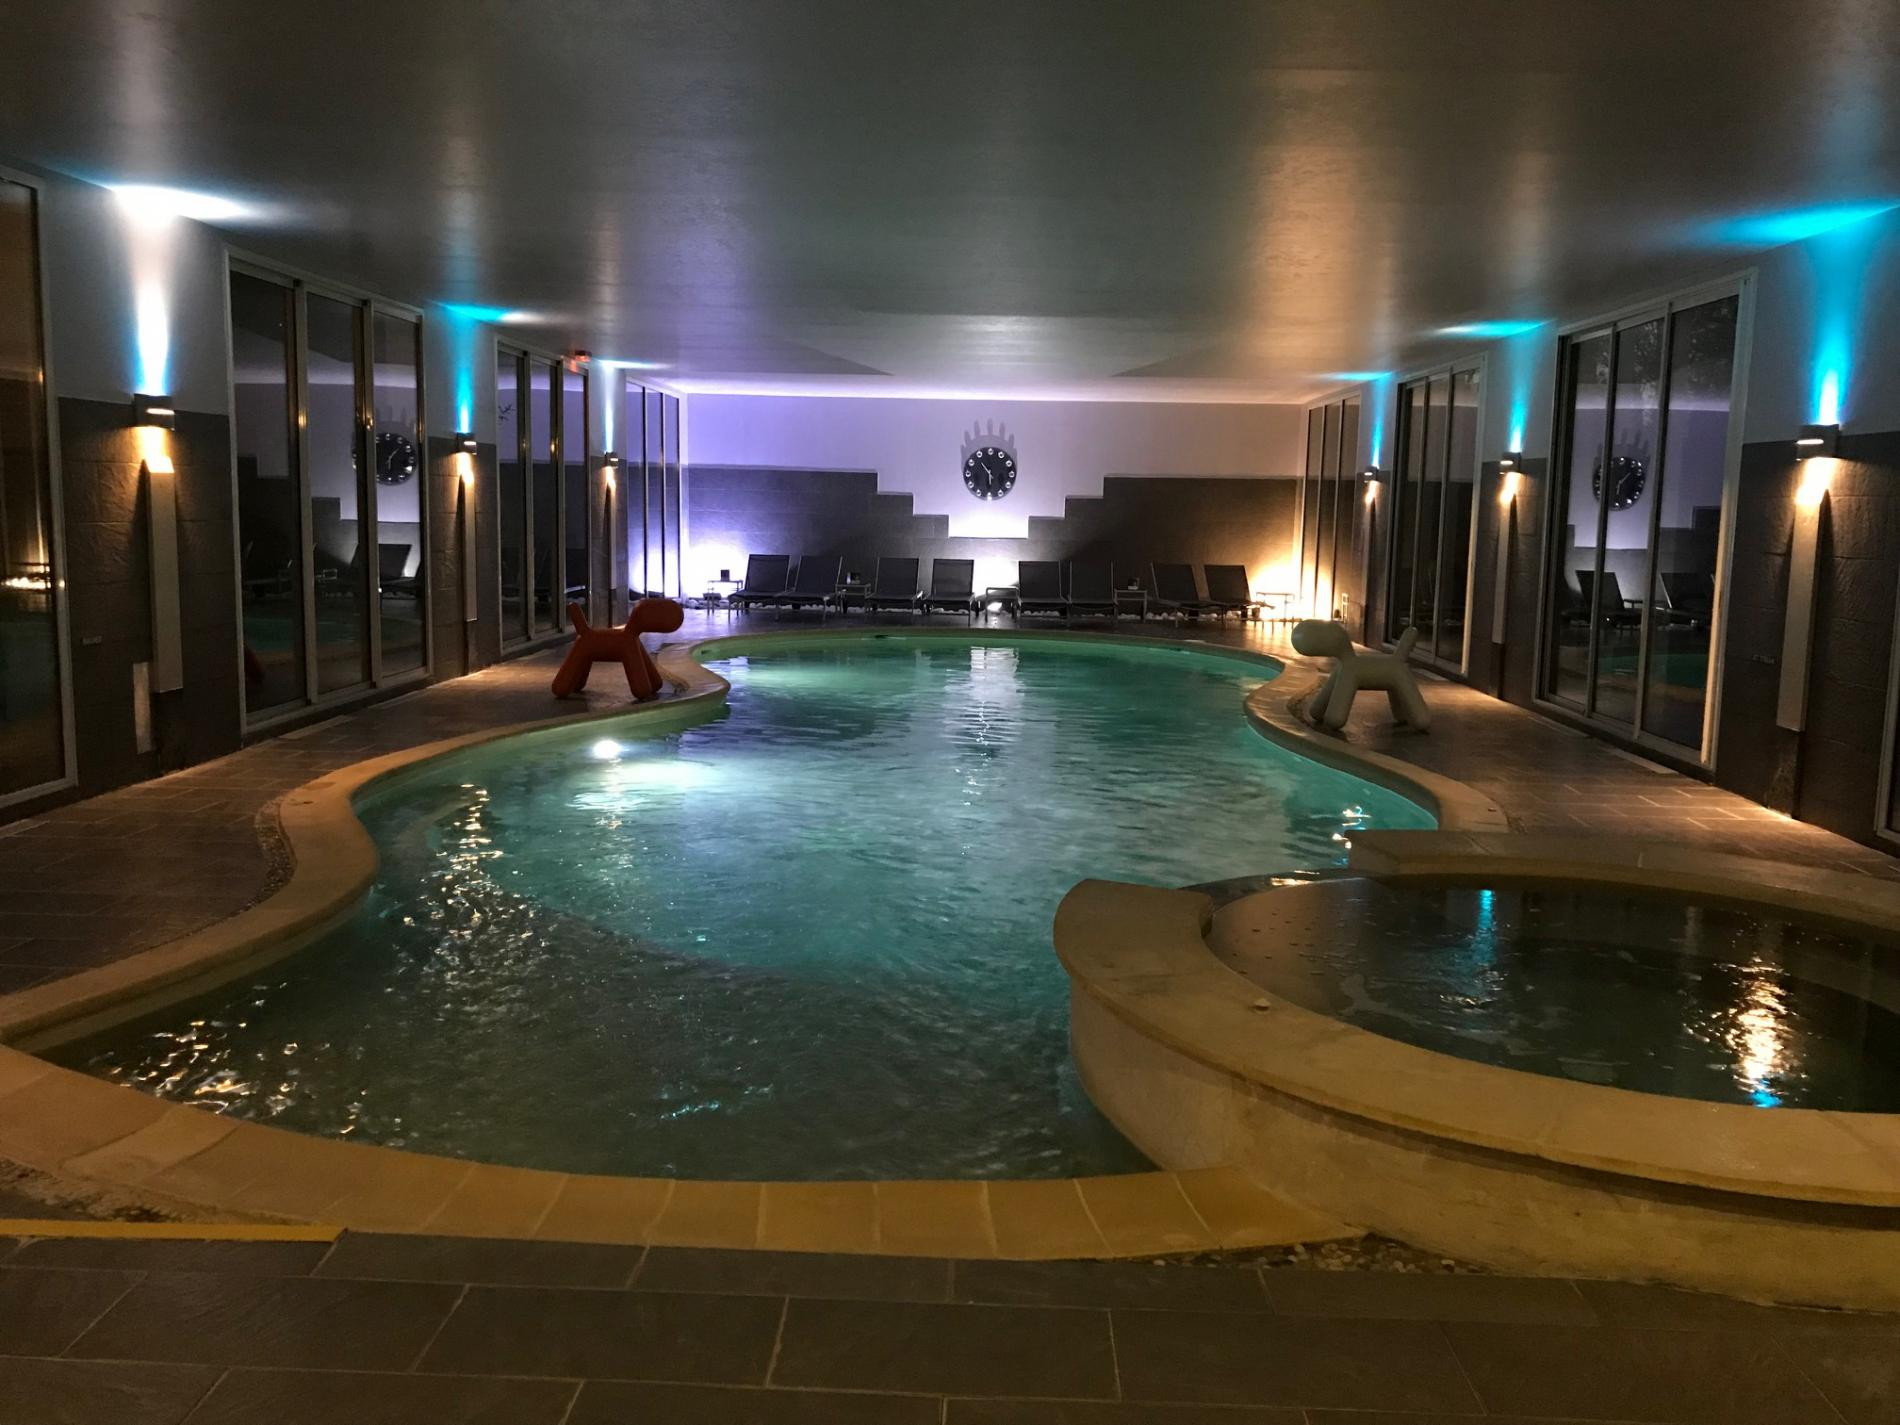 Piscine du spa normandie la piscine couverte du spa entre - Gite avec piscine couverte normandie ...